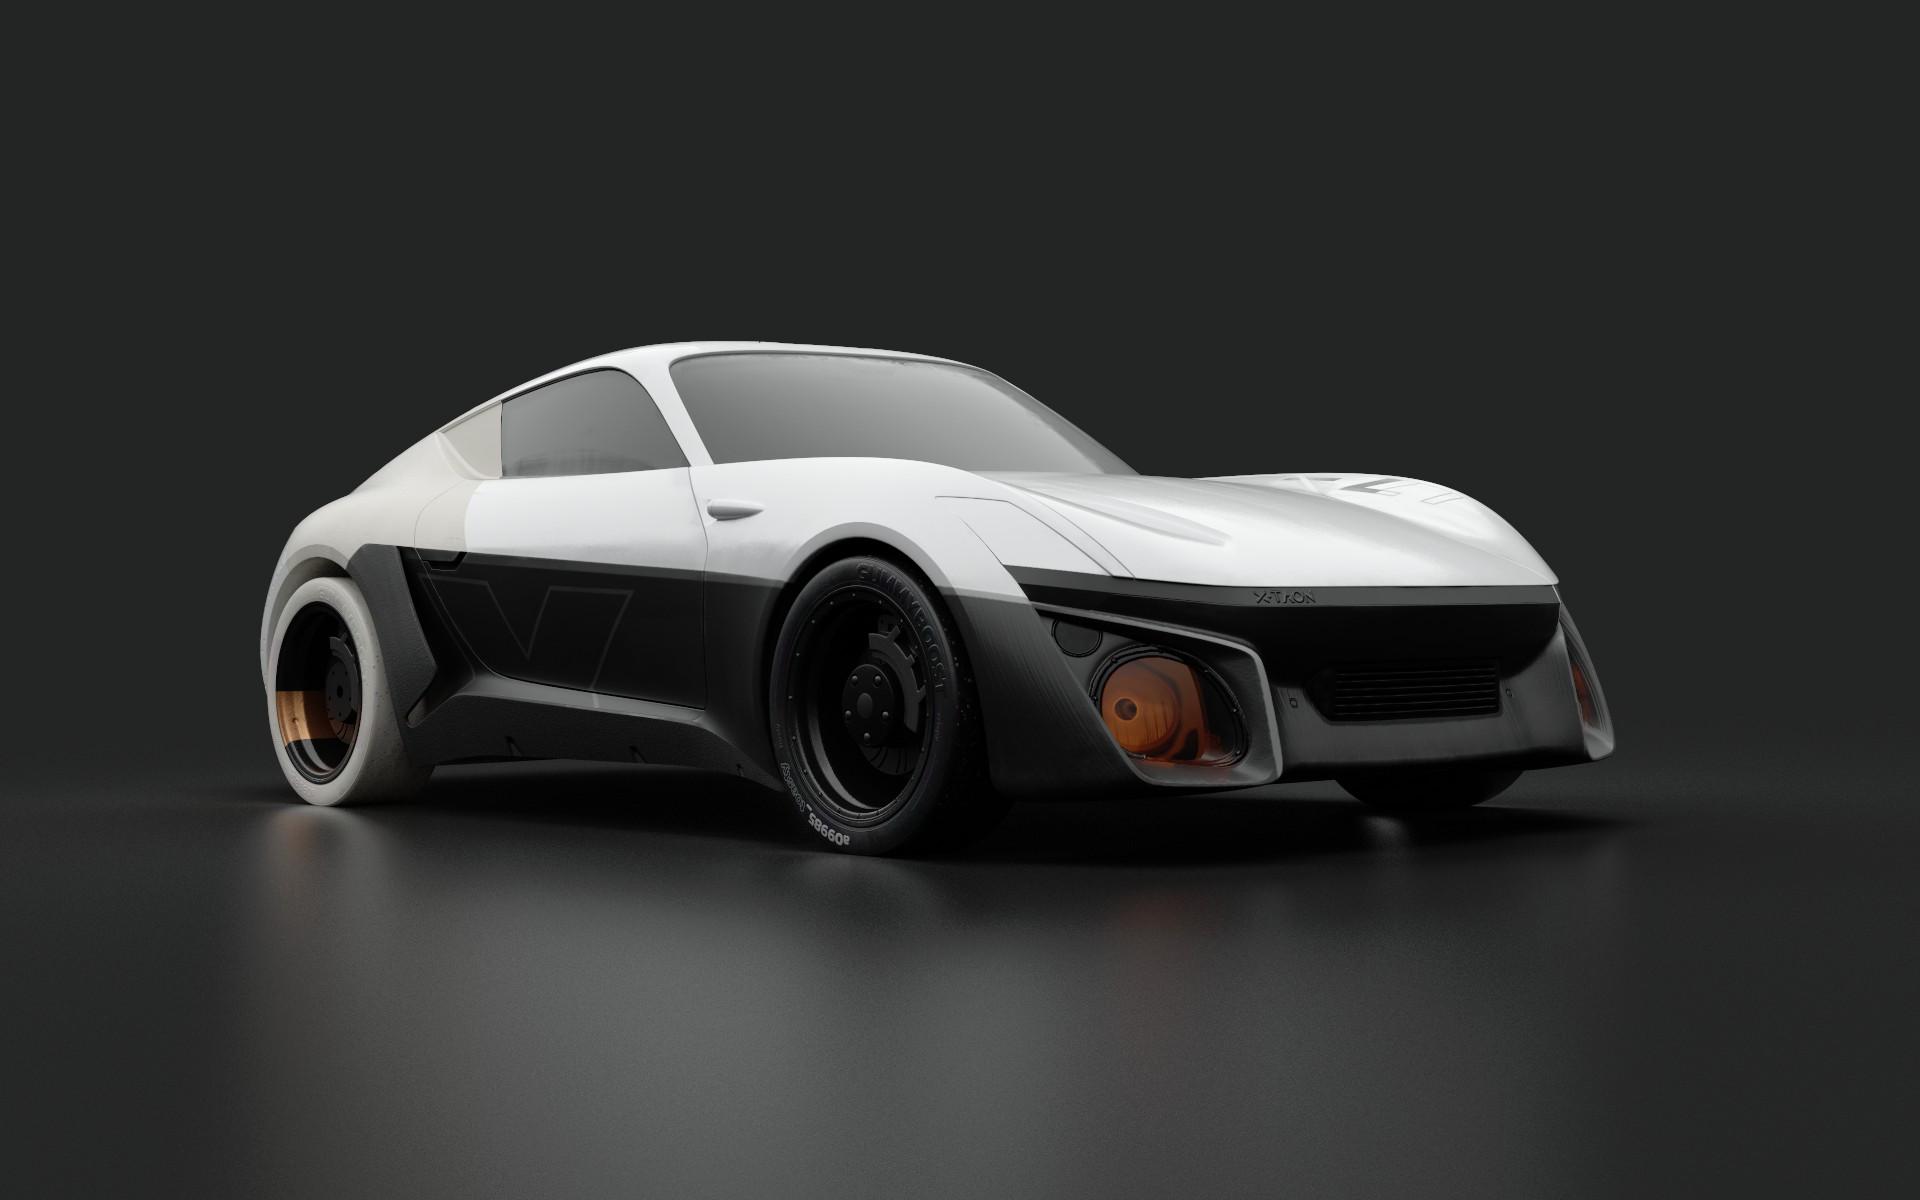 thomas charier xtaon 3D texturing contest substance painter concept car front